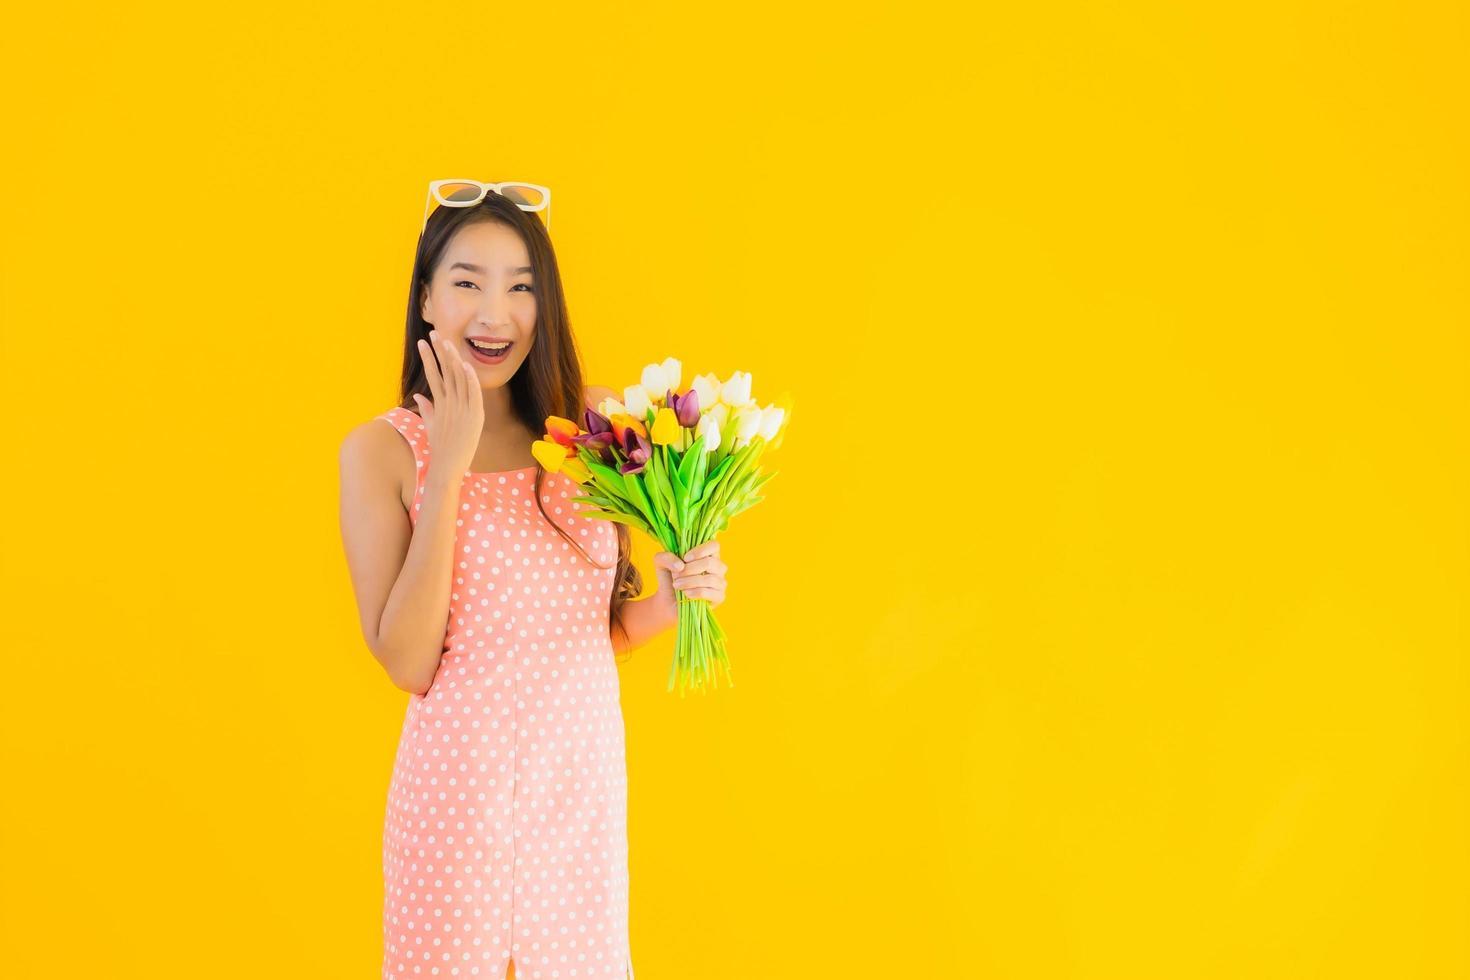 Frau hält Blumenstrauß foto